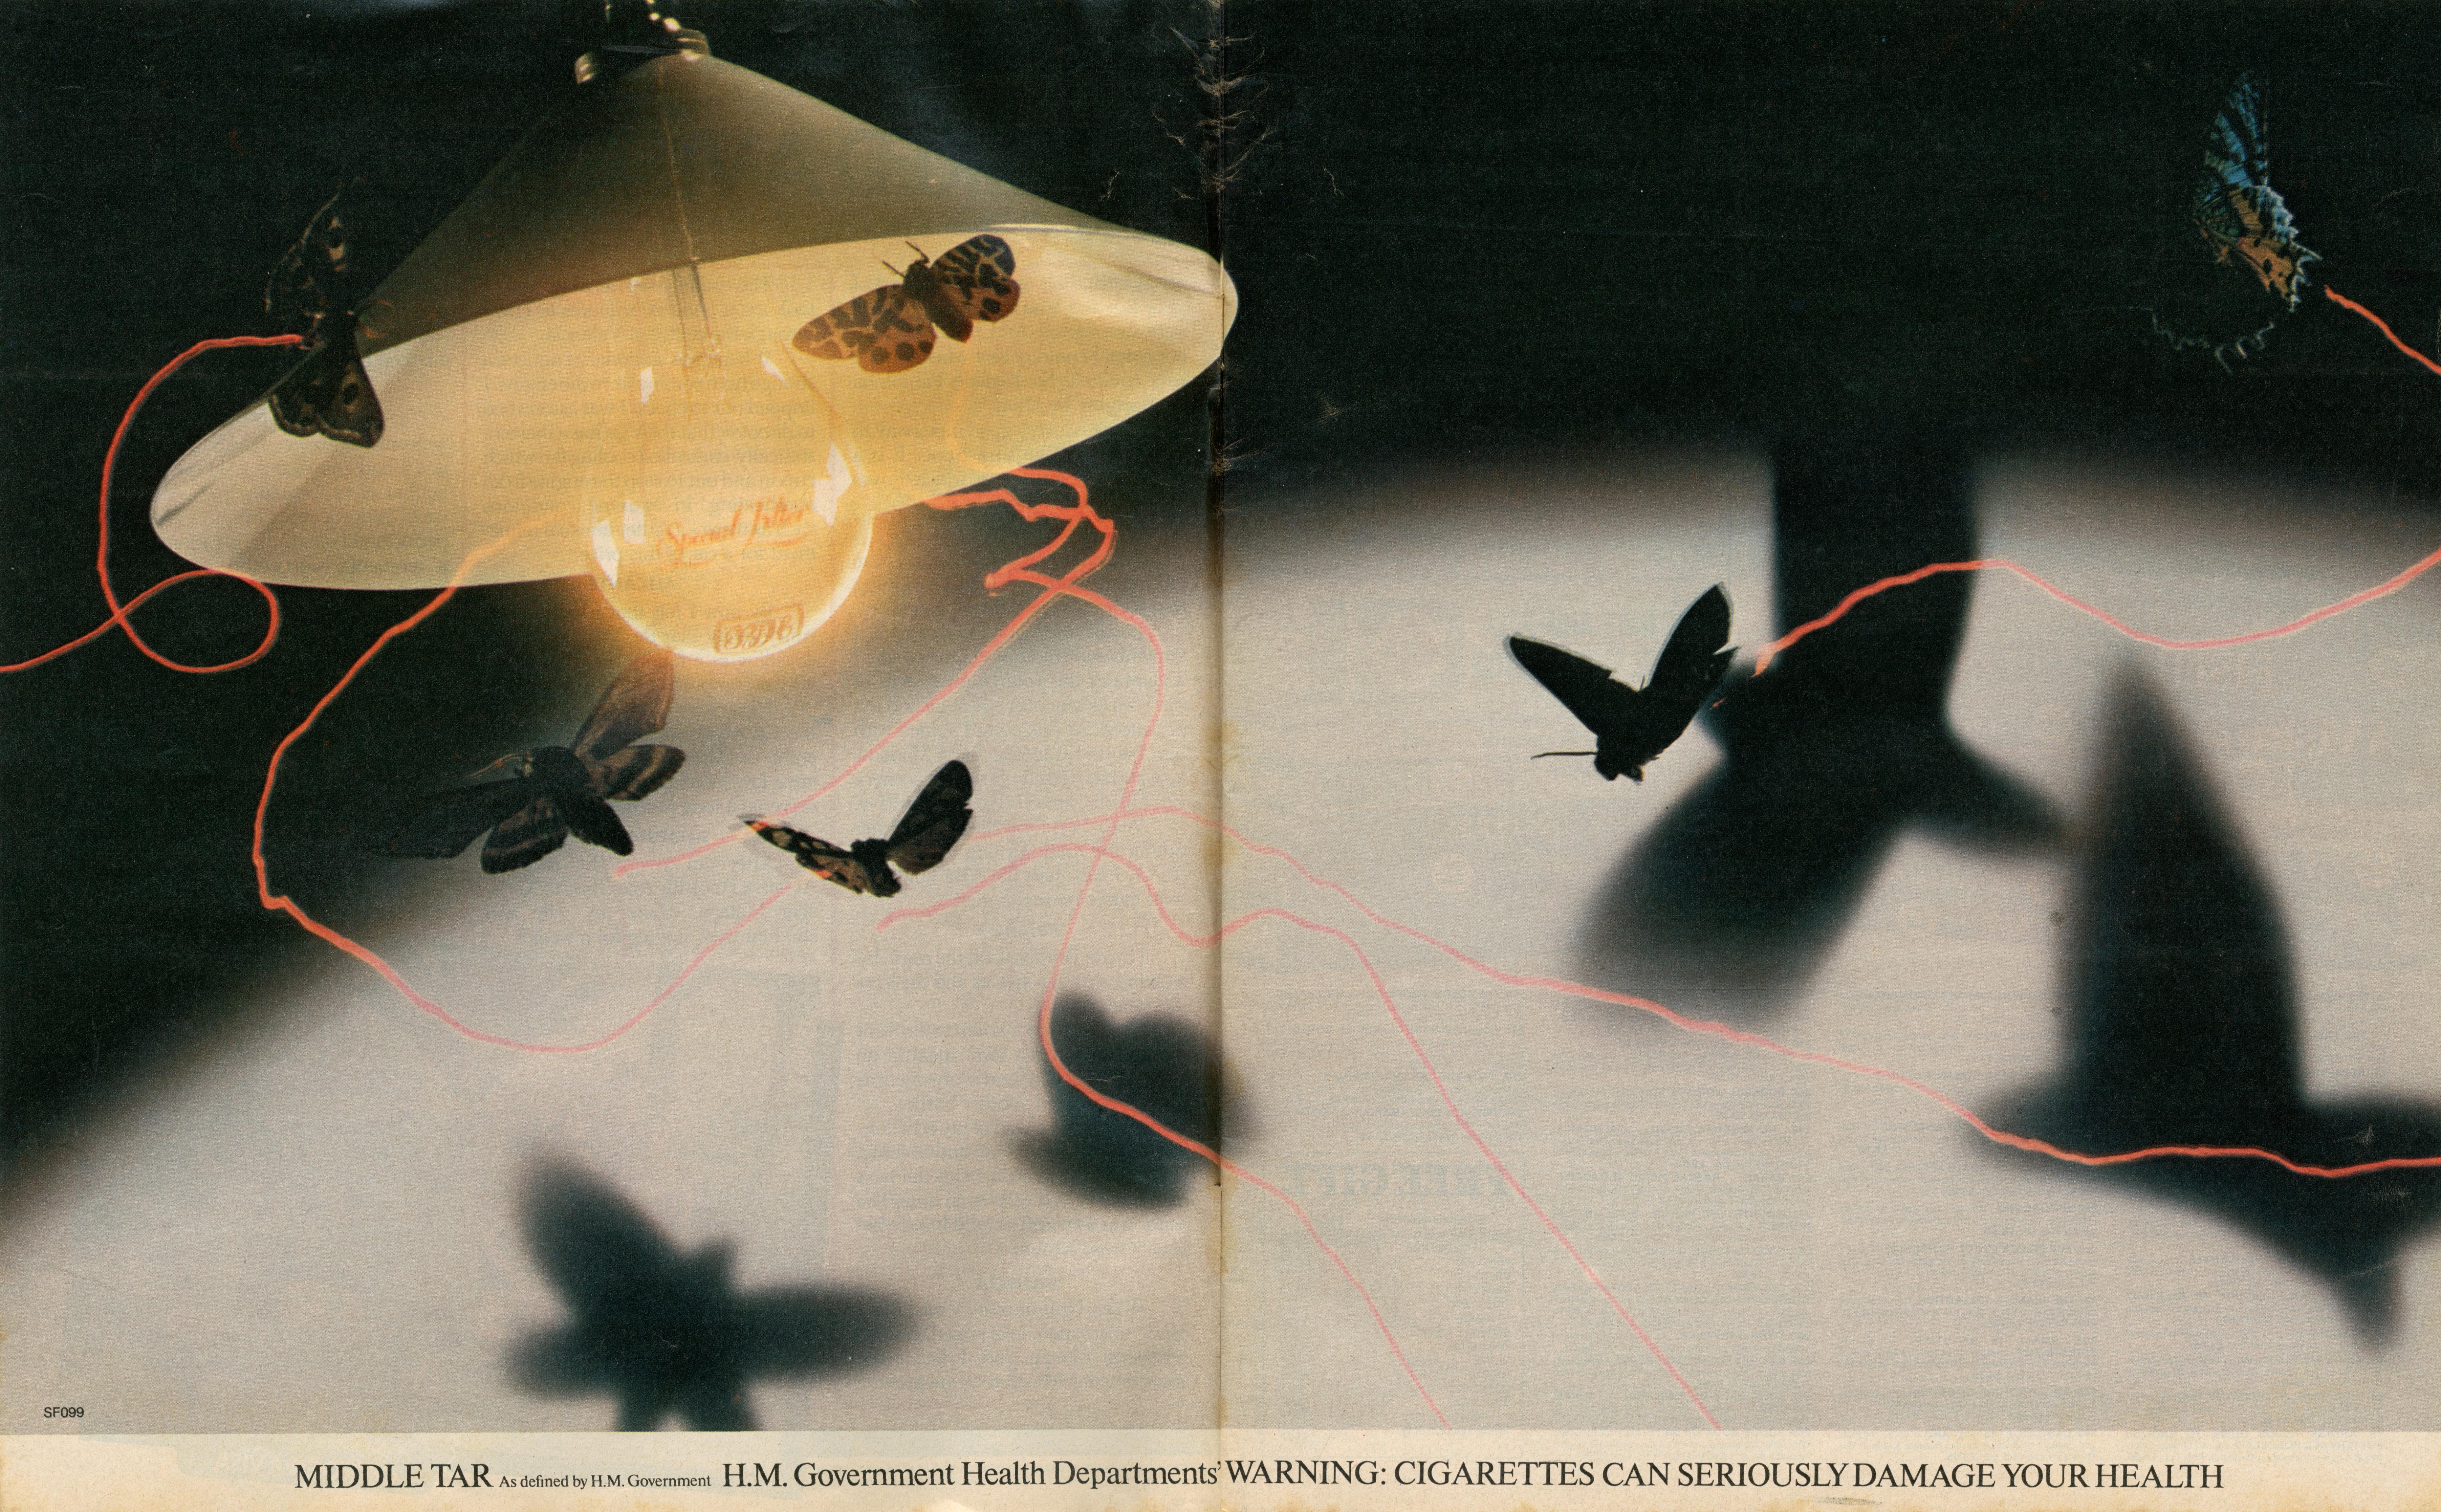 B&H 'Moth', Neil Godfrey, CDP-01